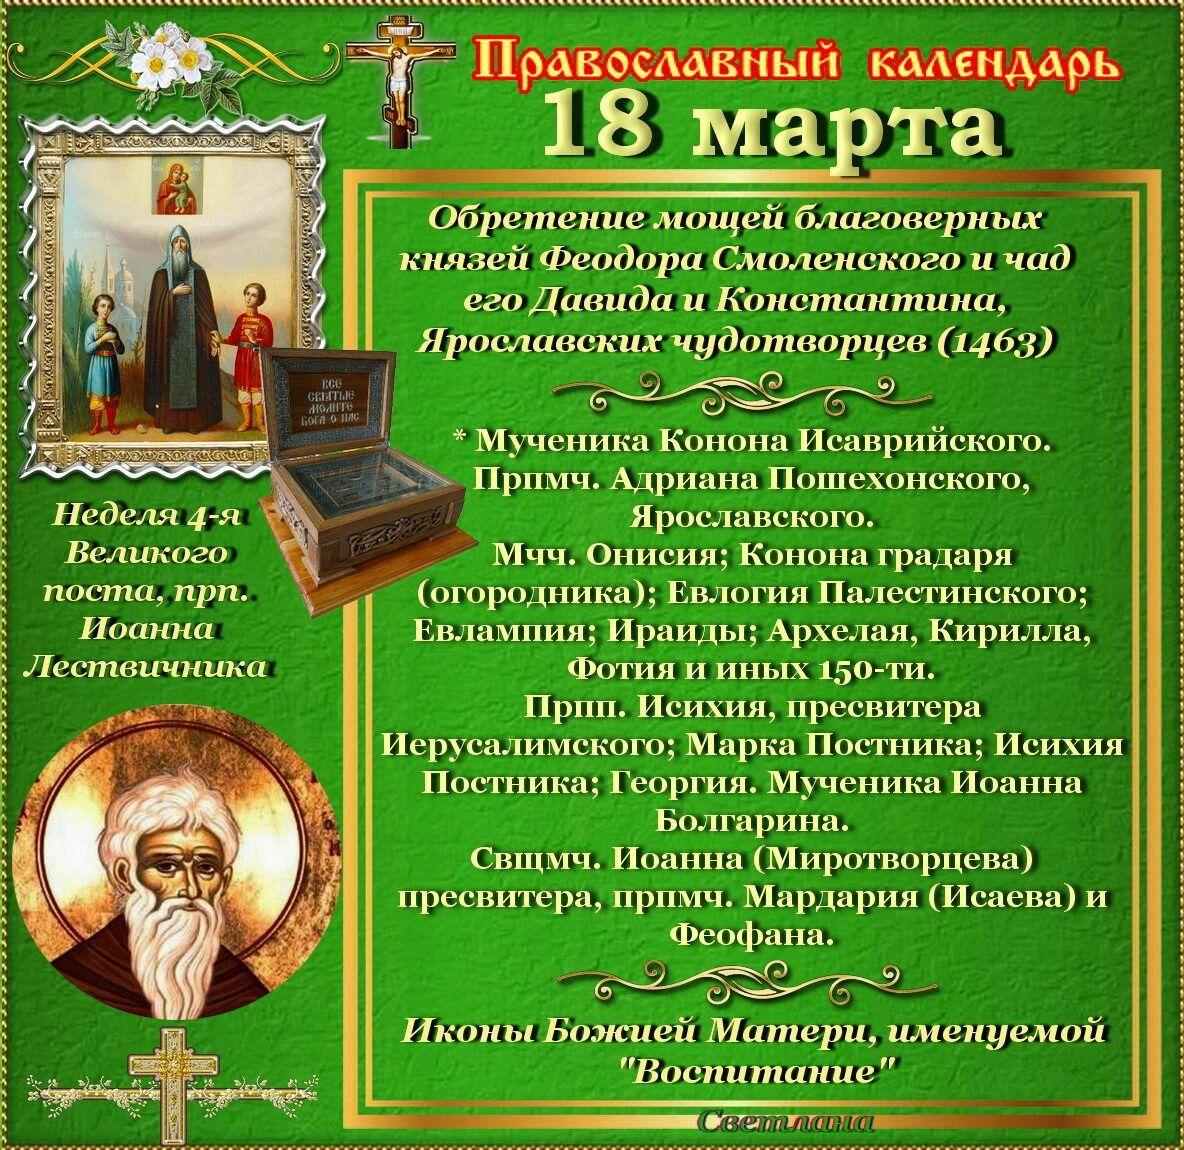 18 марта в православном календаре